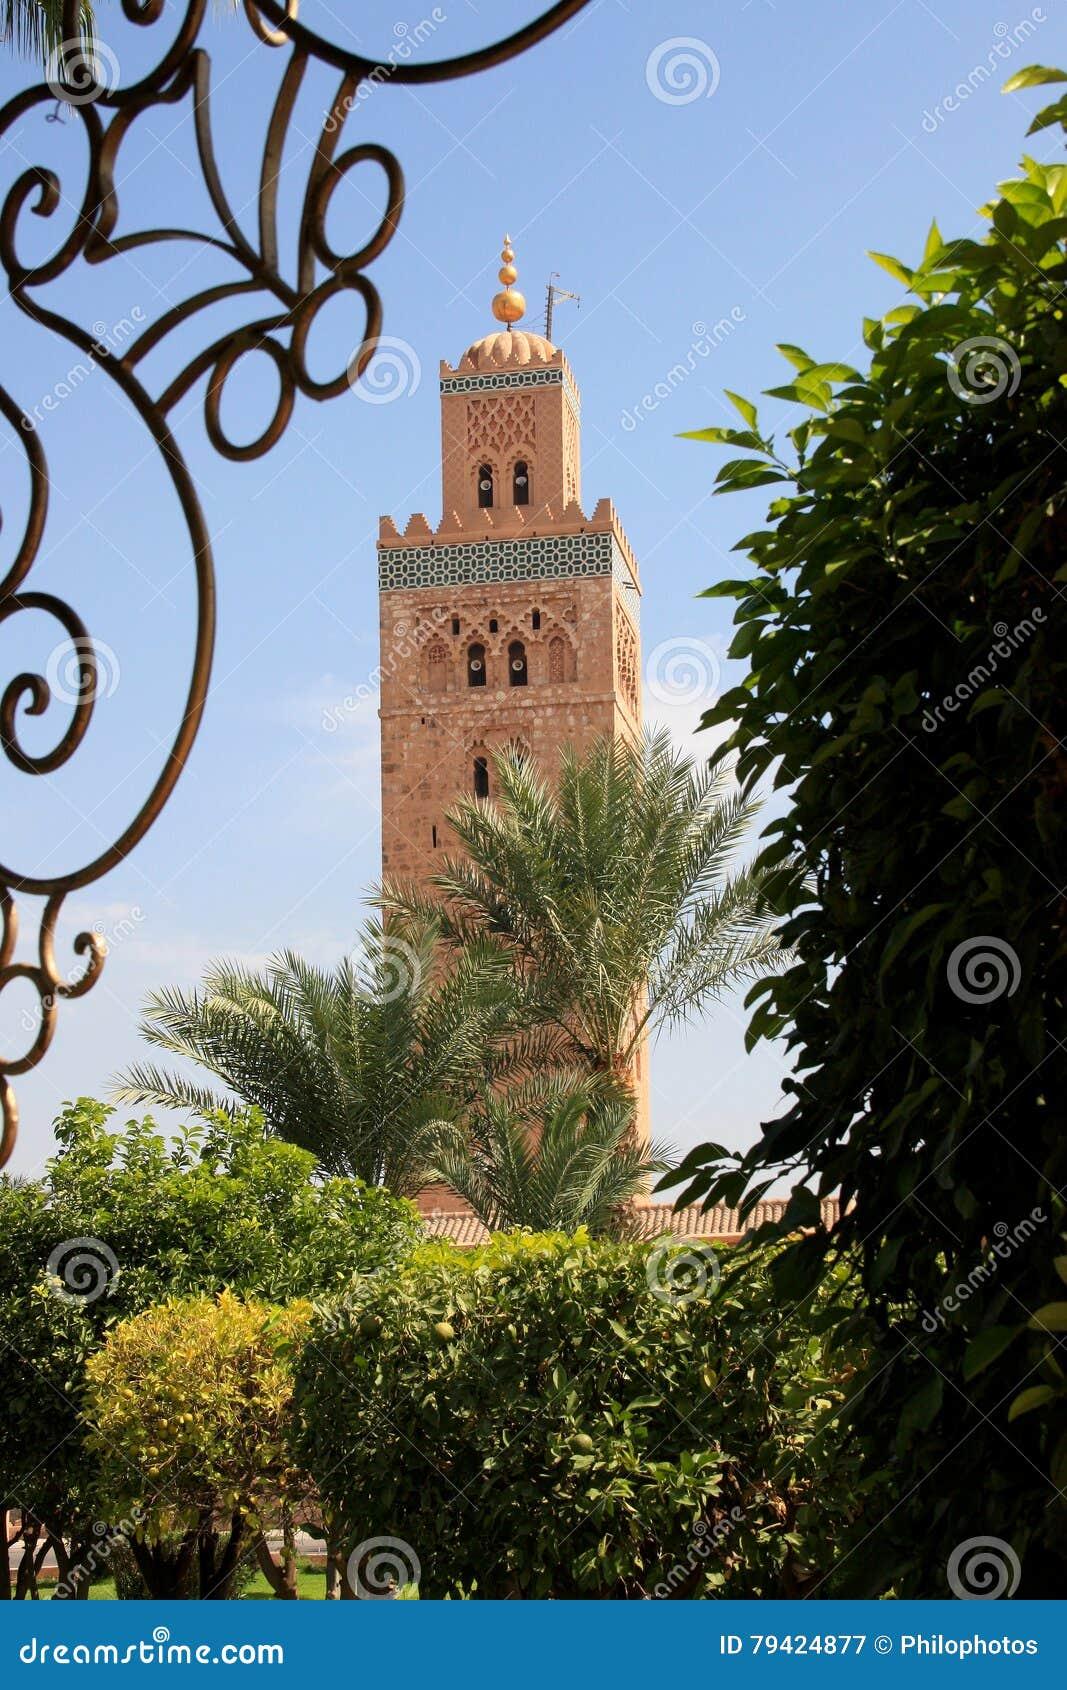 Afrique - Maroc - Marrakesh